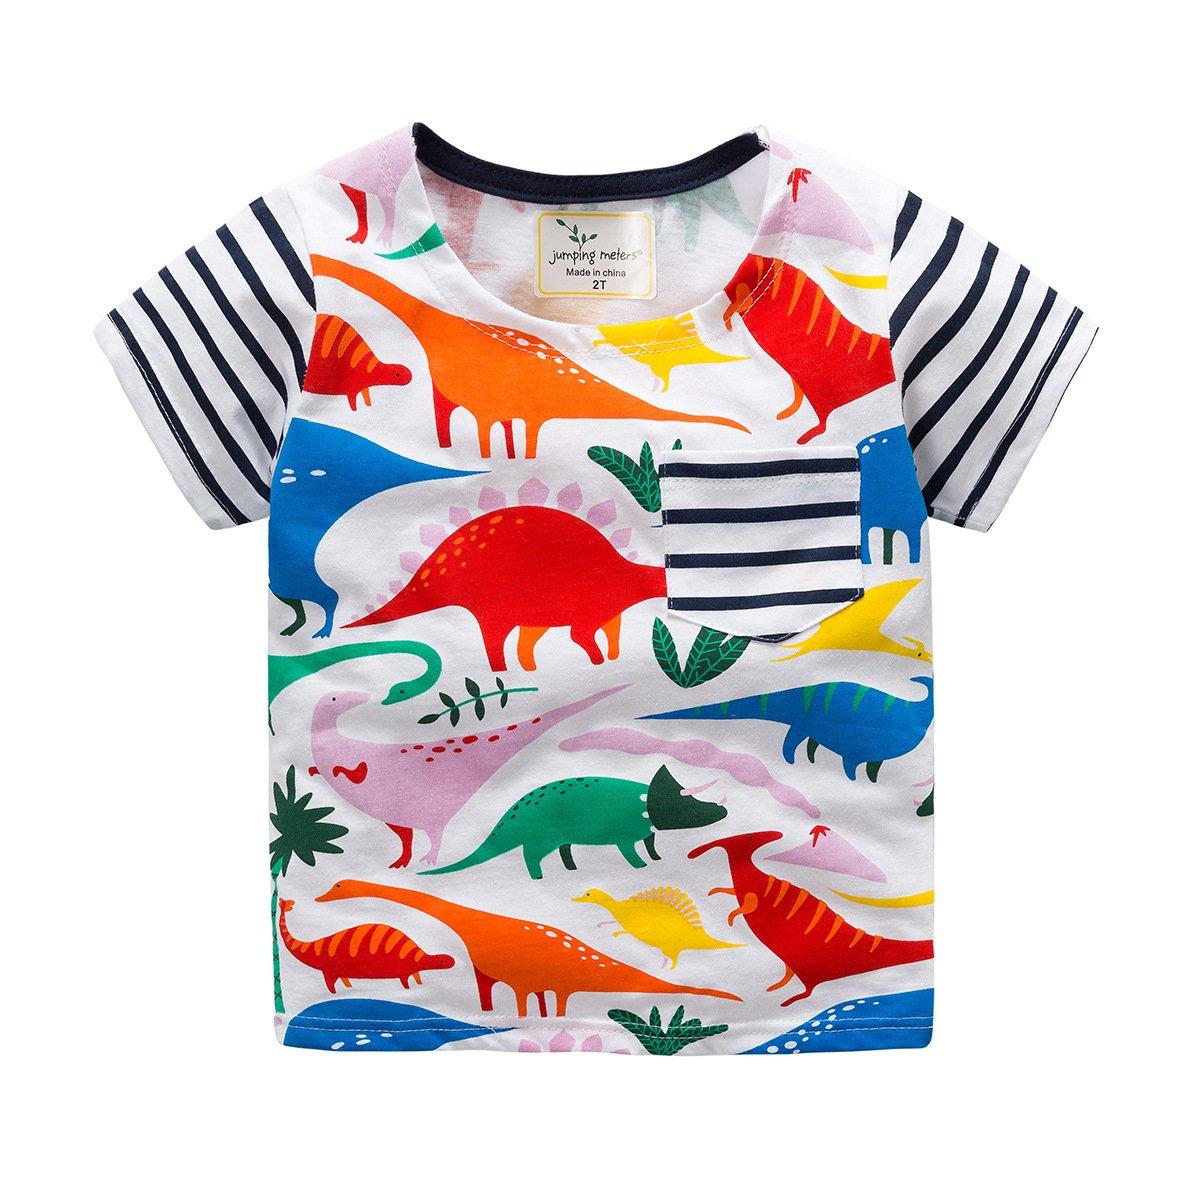 KIDSALON Little Girls Cotton Crewneck Solid Short Sleeve T-Shirt by